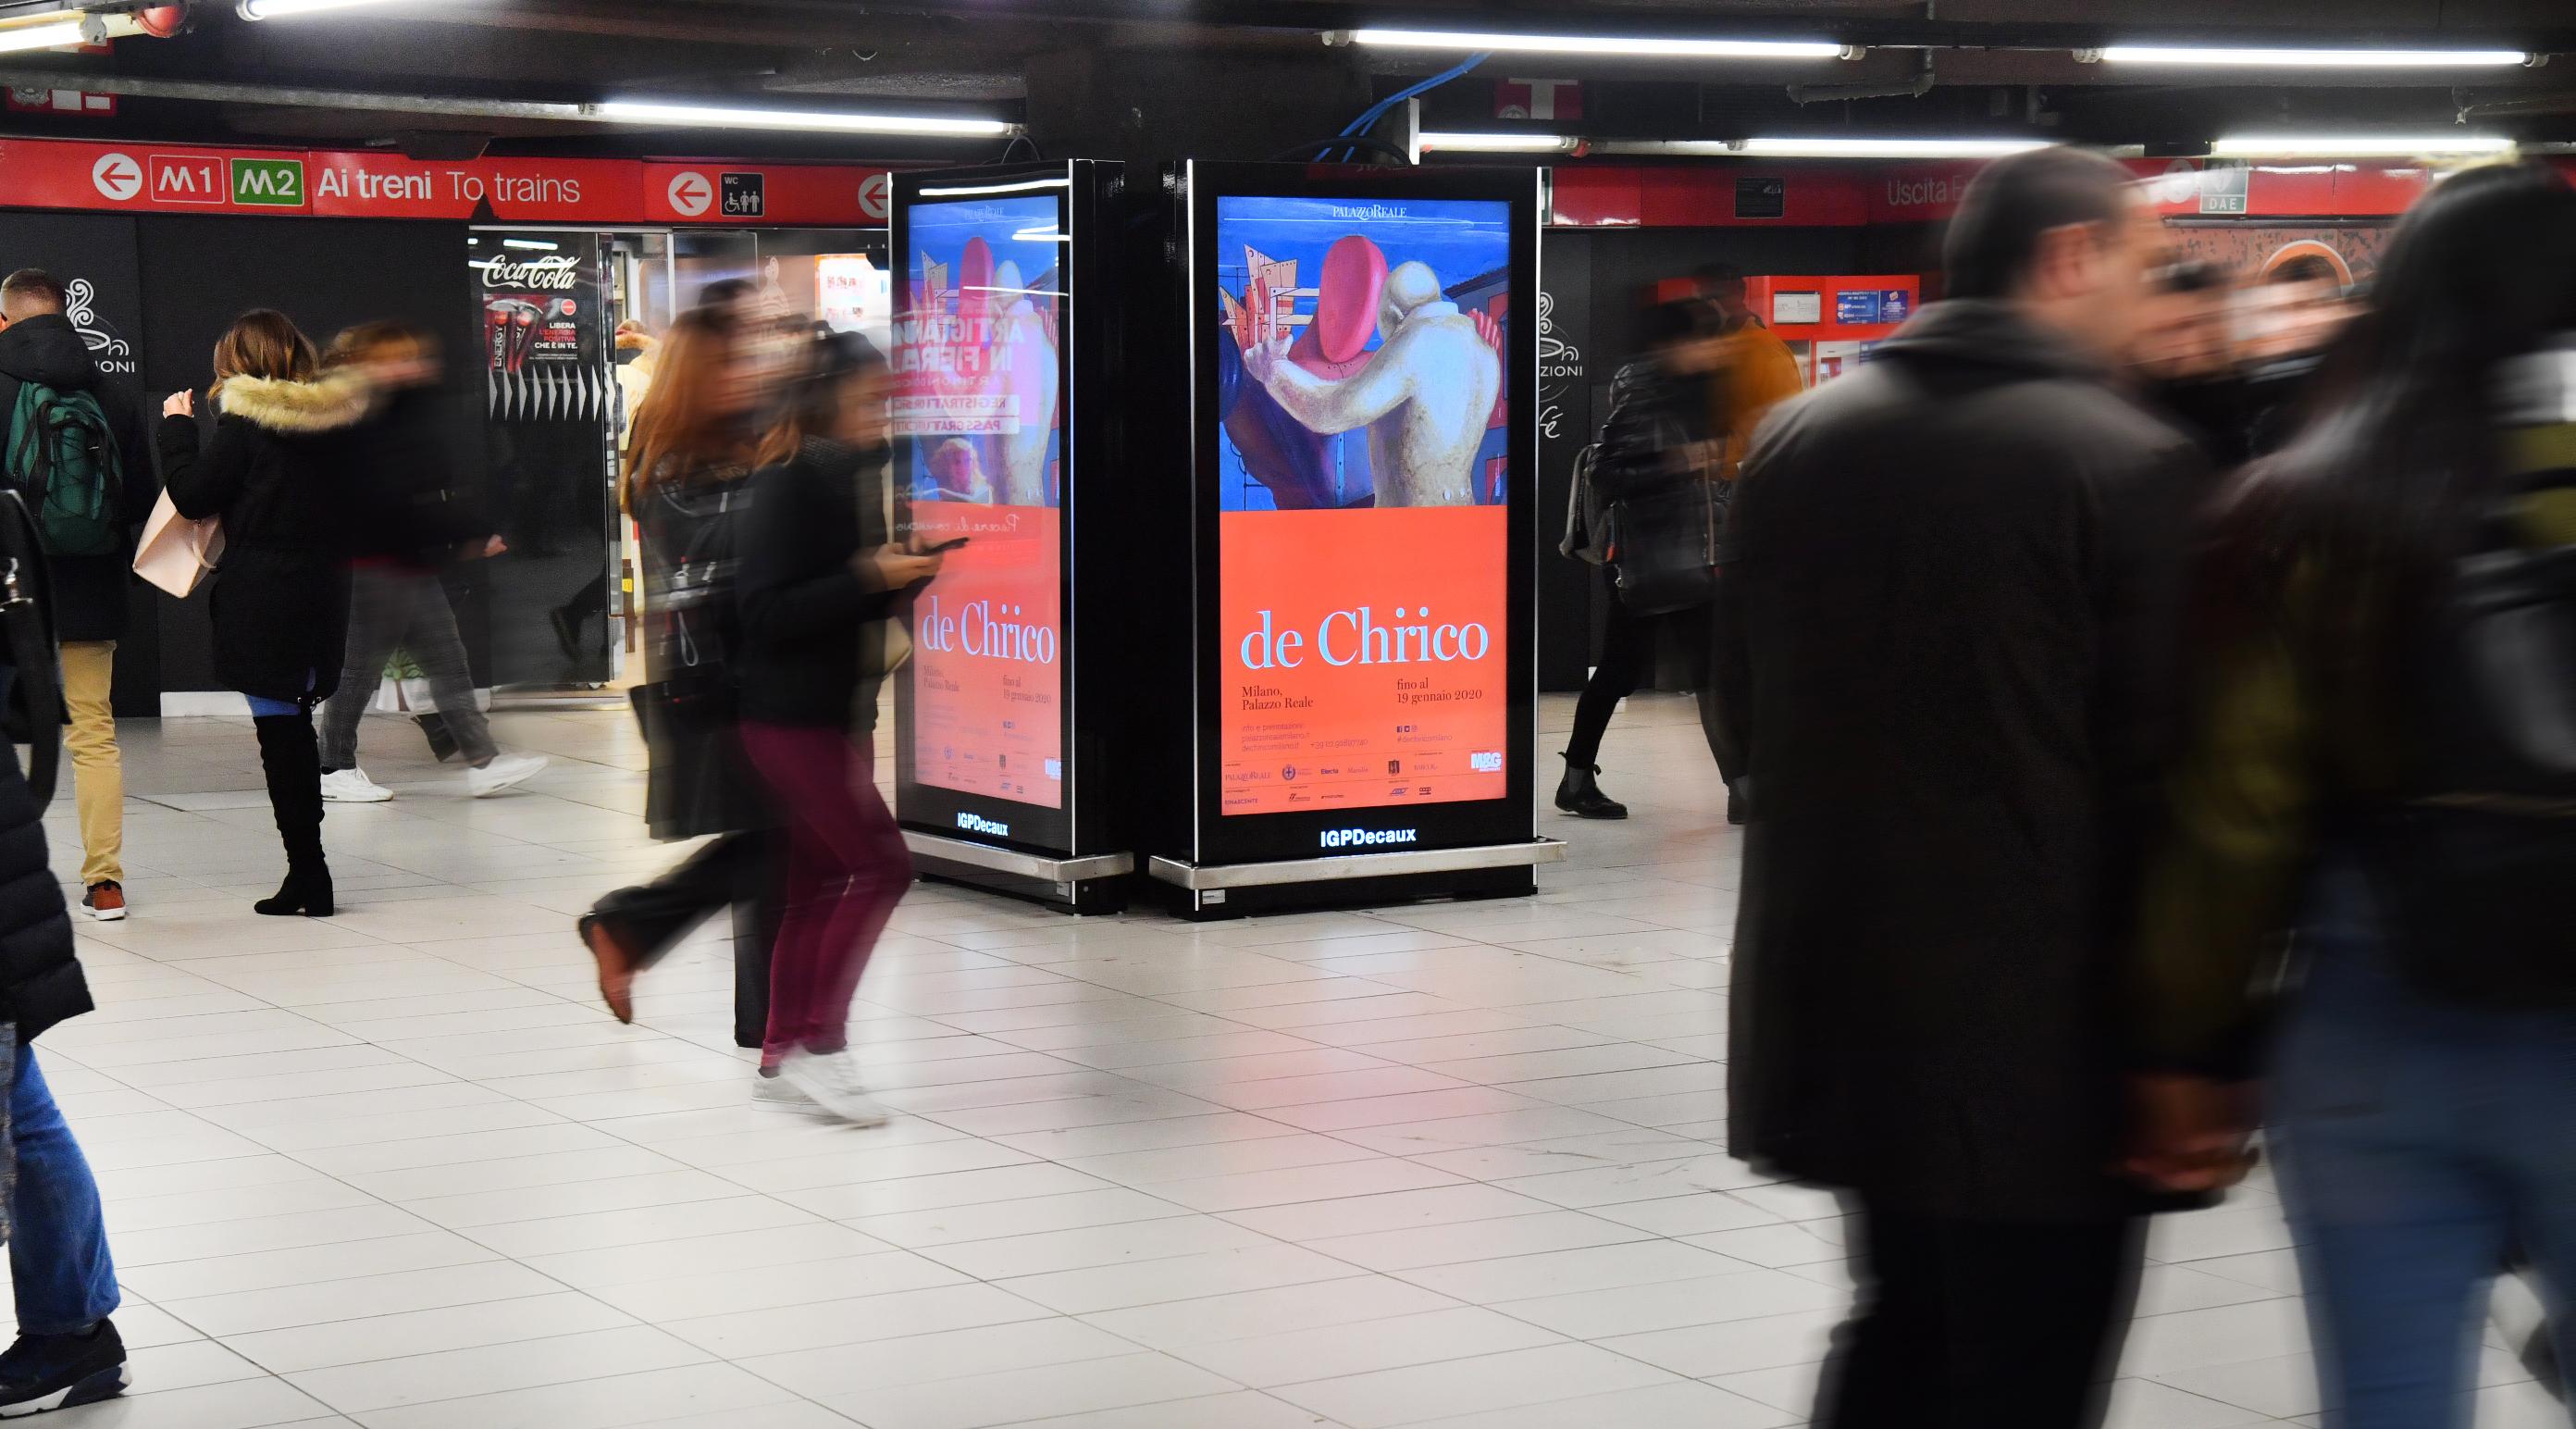 Schermi_iVision_IGPDecaux_Metropolitana_Milano